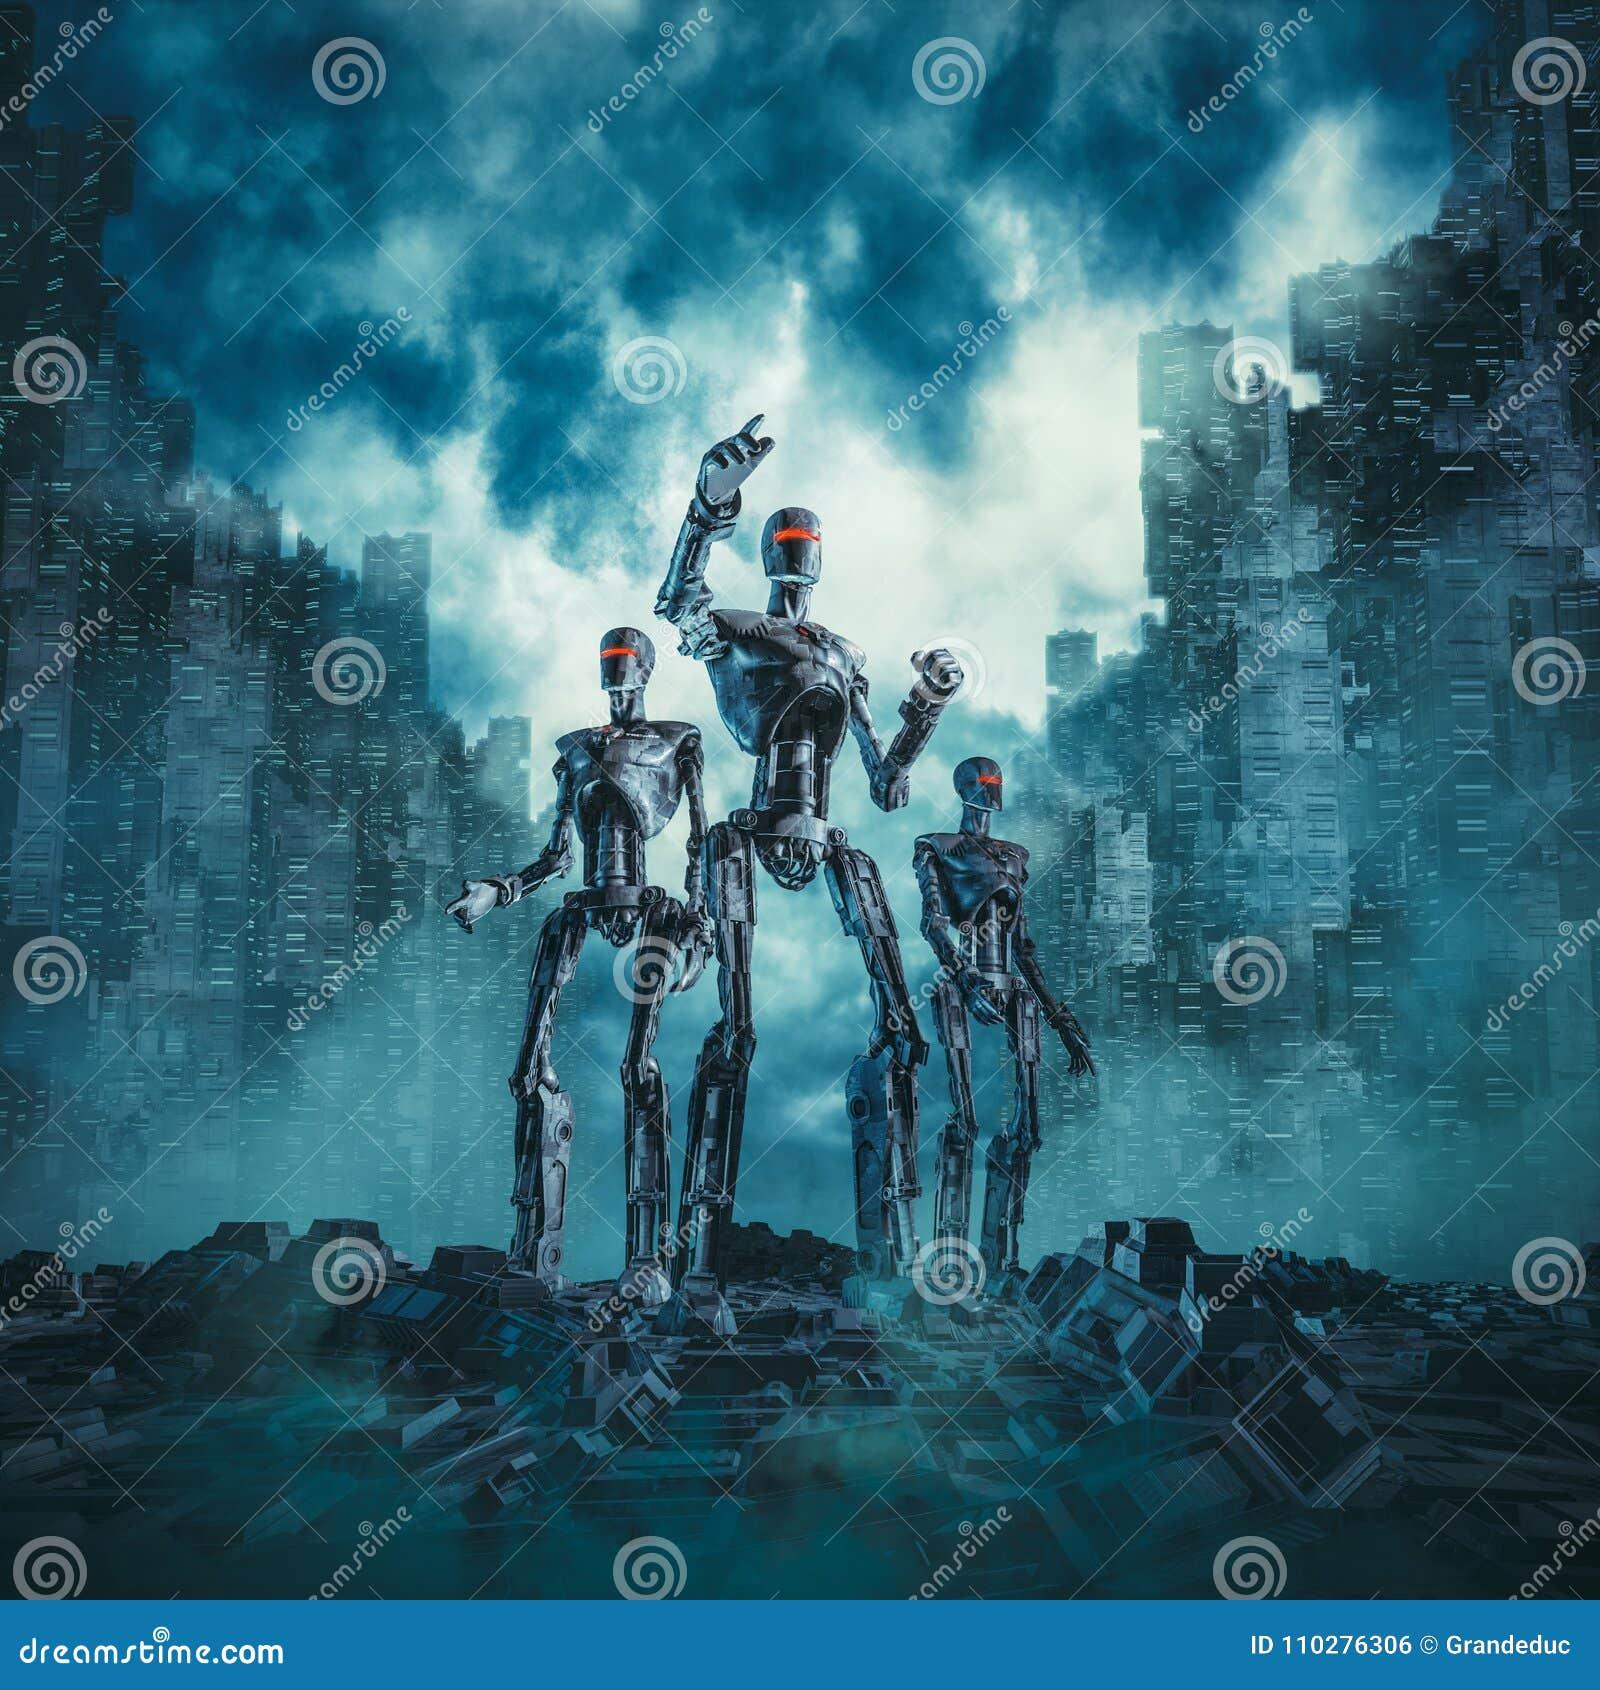 Robots on patrol